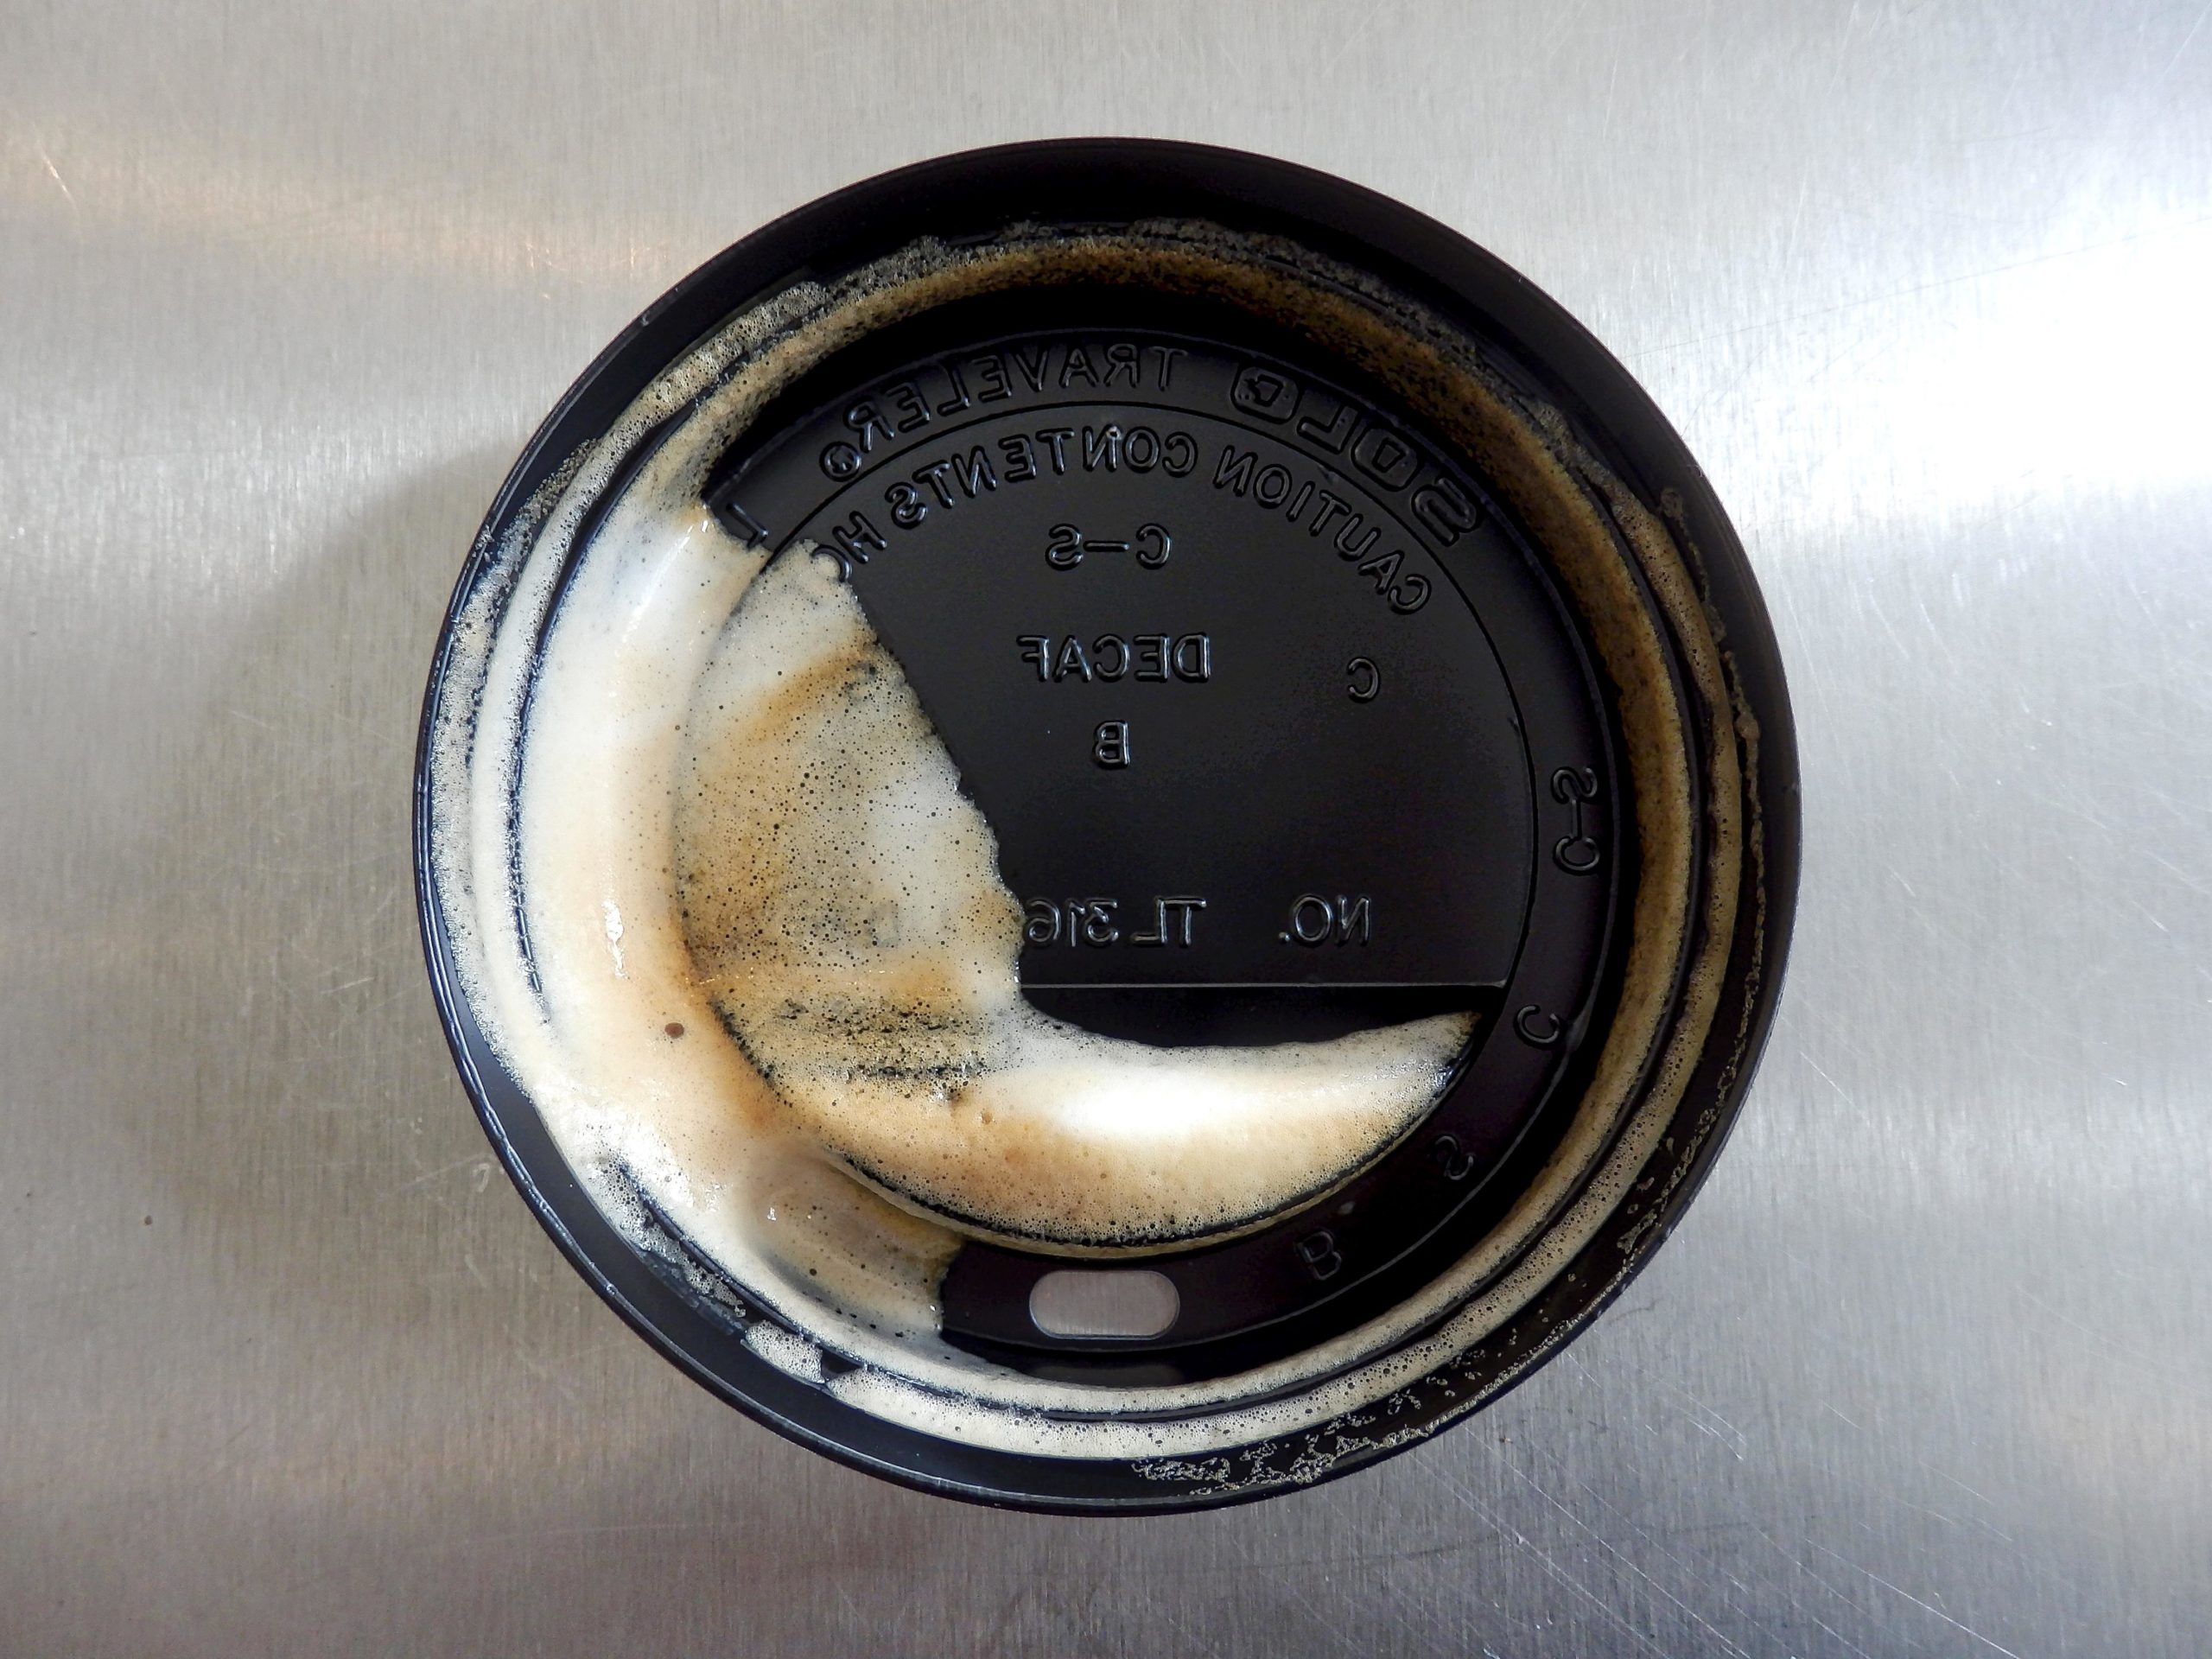 liability coffee duty care